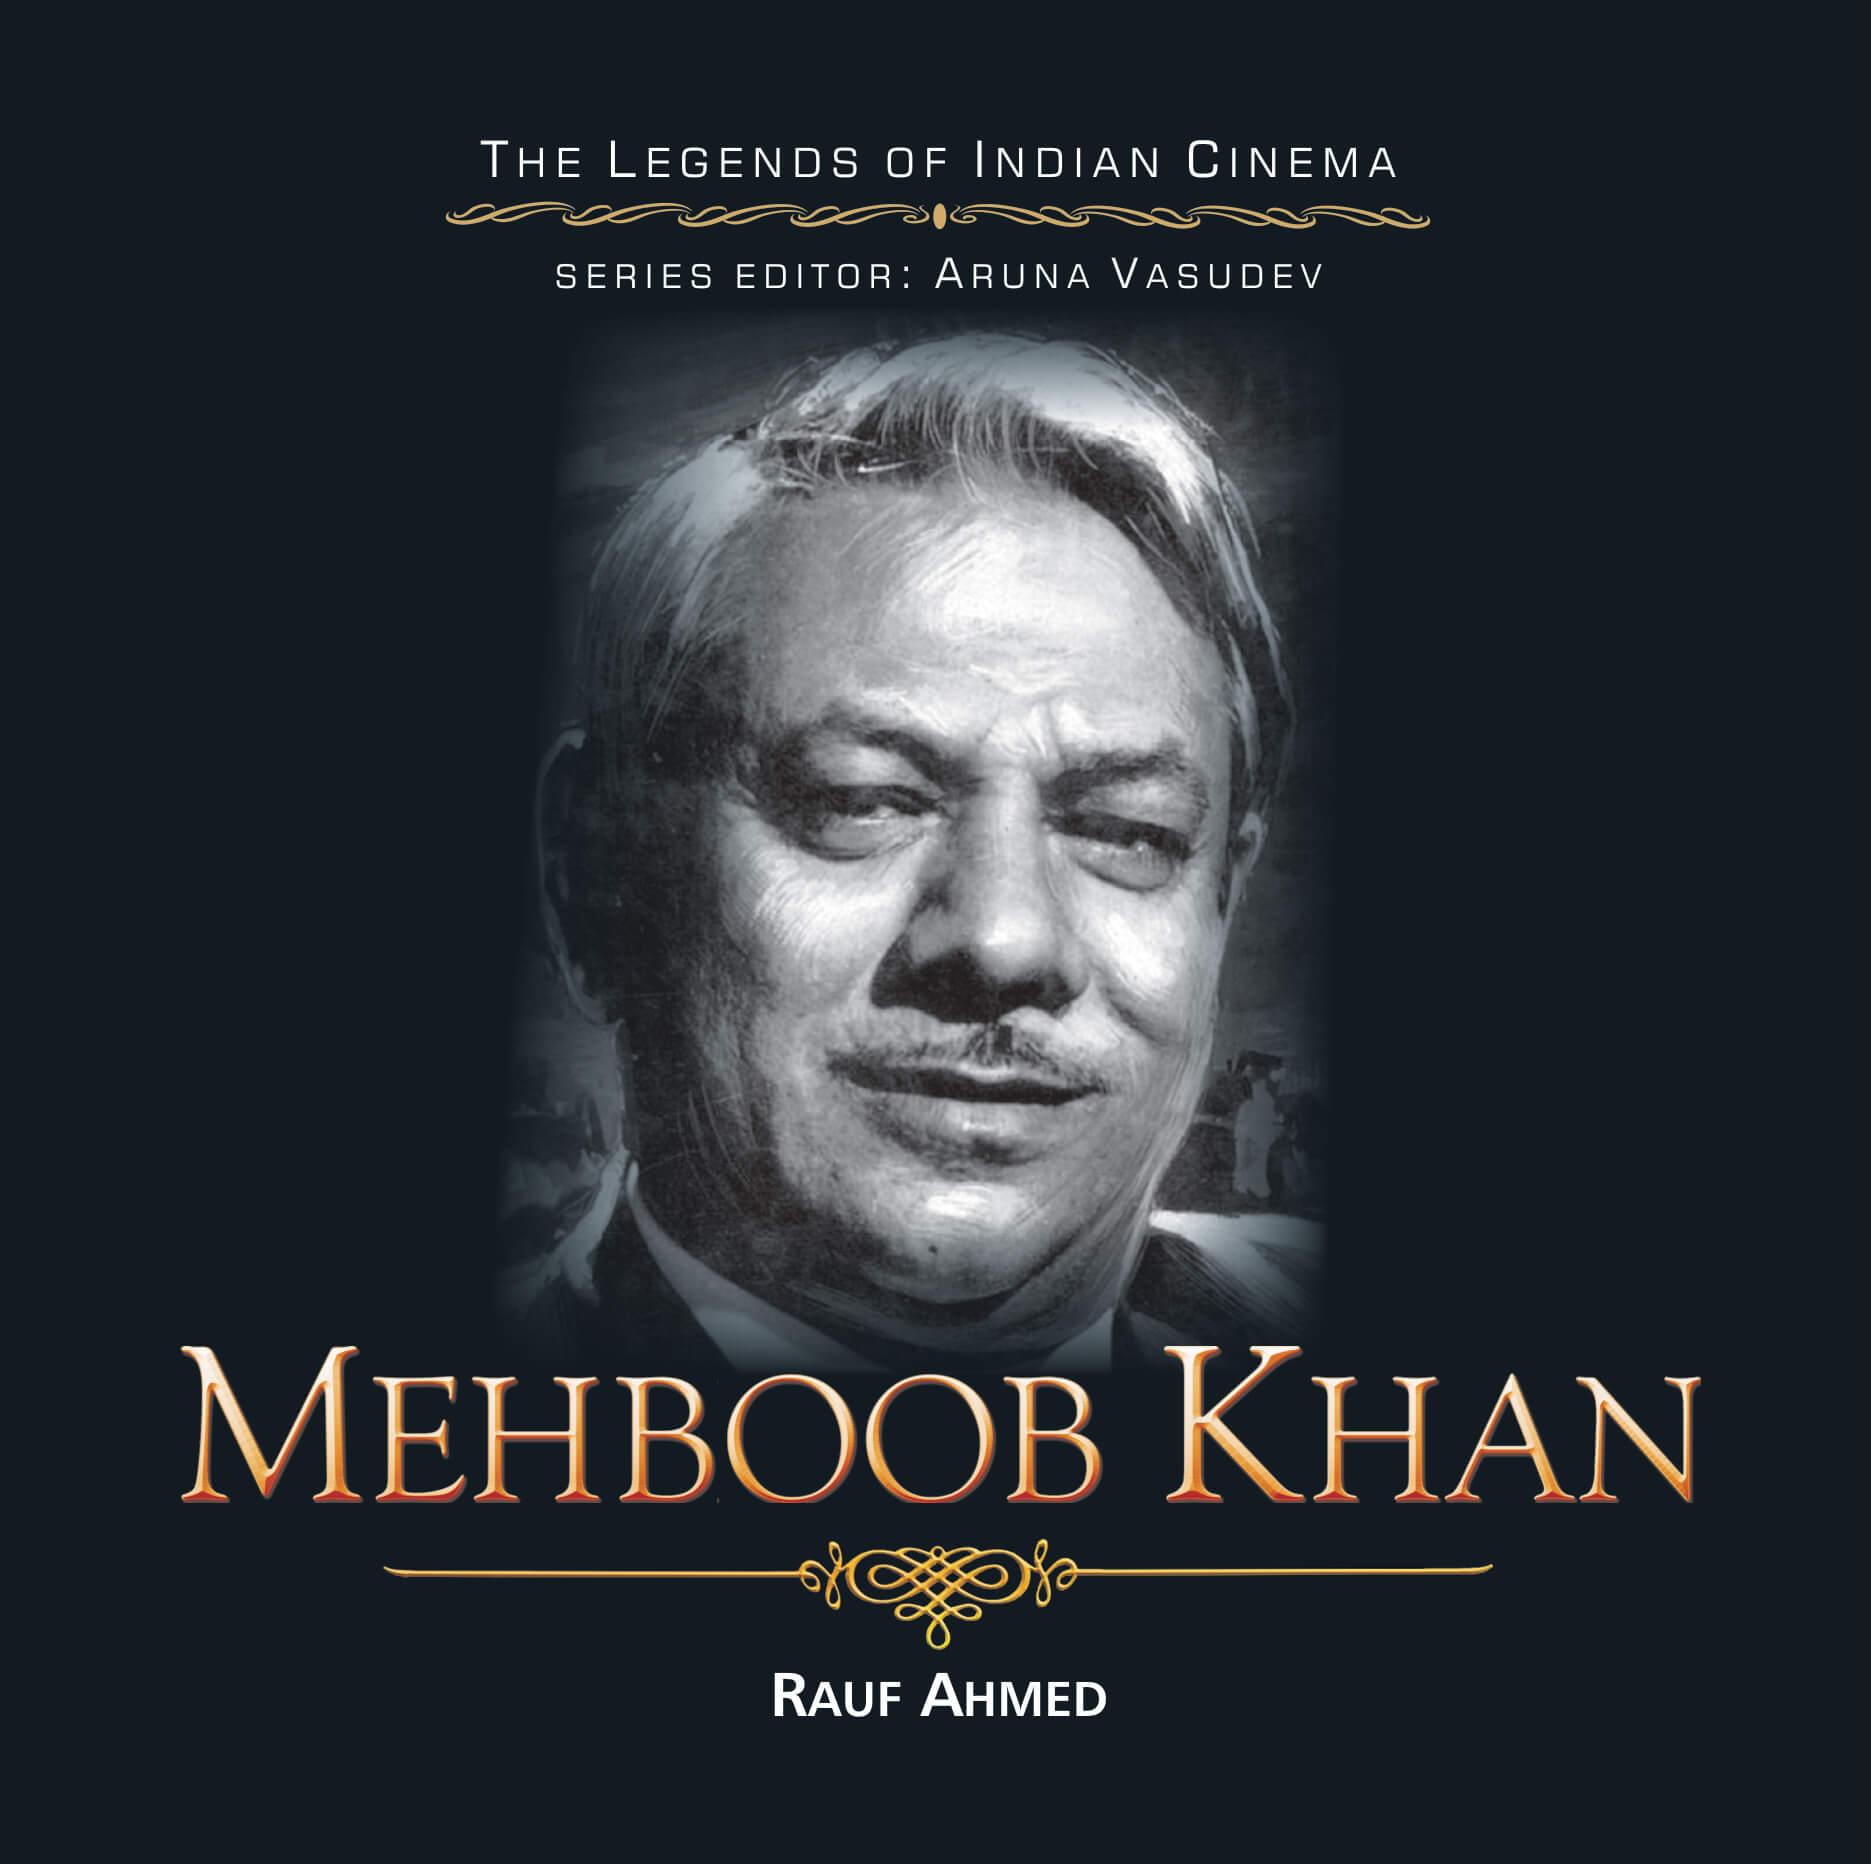 Mehboob Khan (The Legends of Indian Cinema)